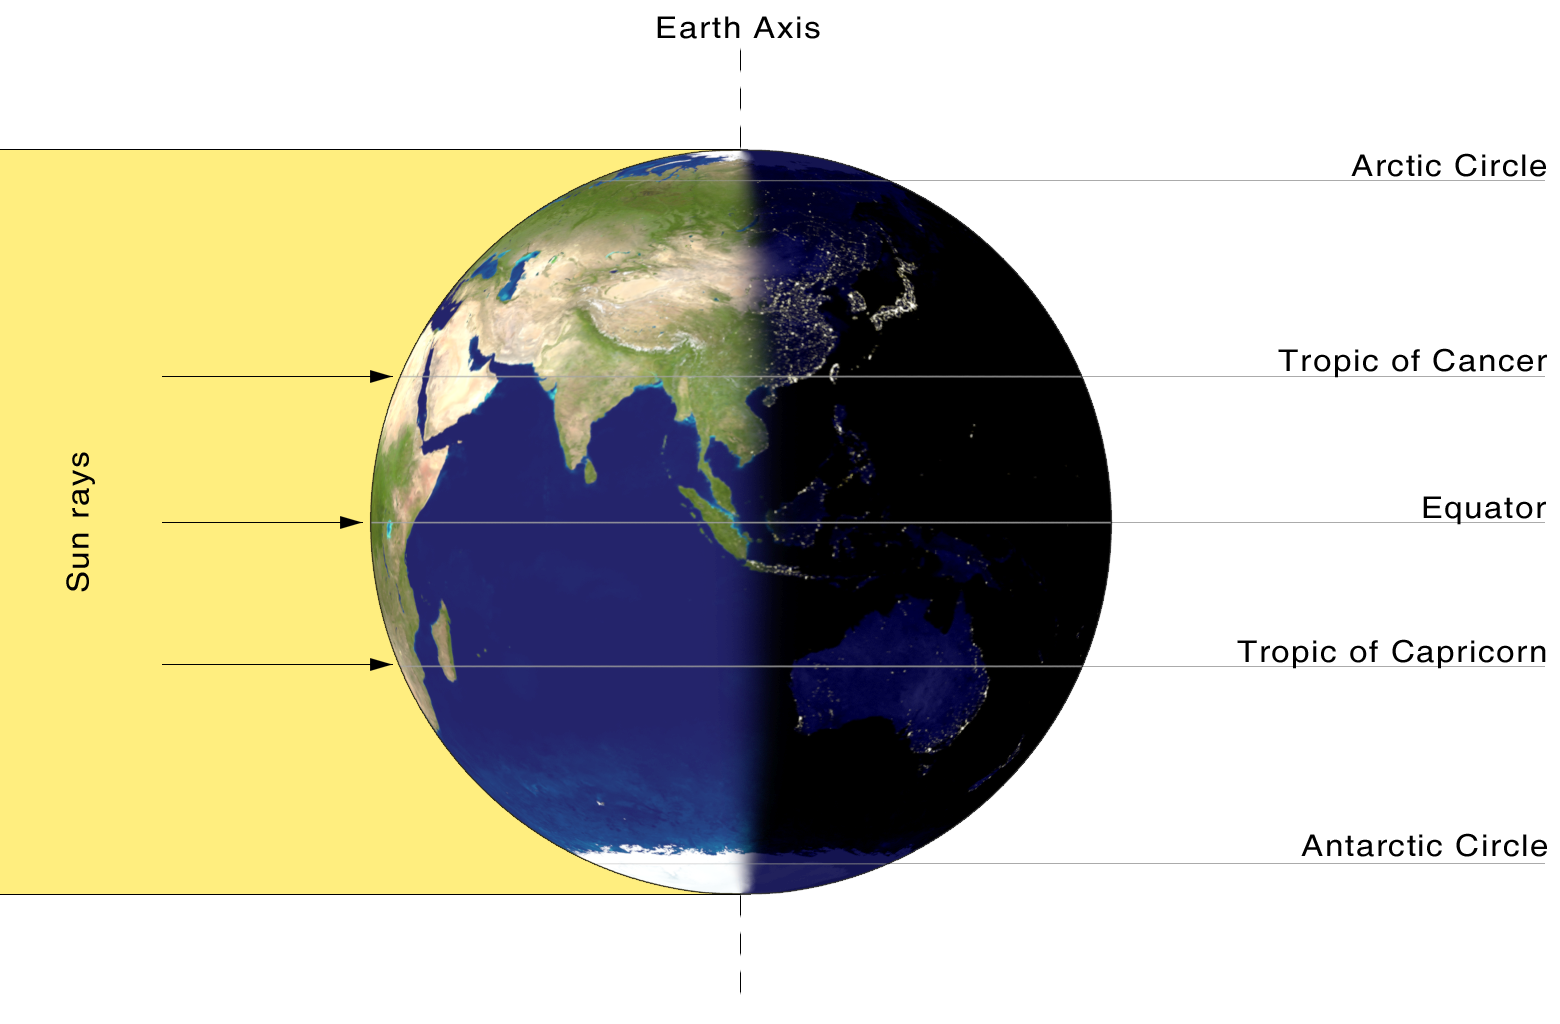 http://www.allabout-energy.com/Pphotos/earth-lighting-equinox_en.png